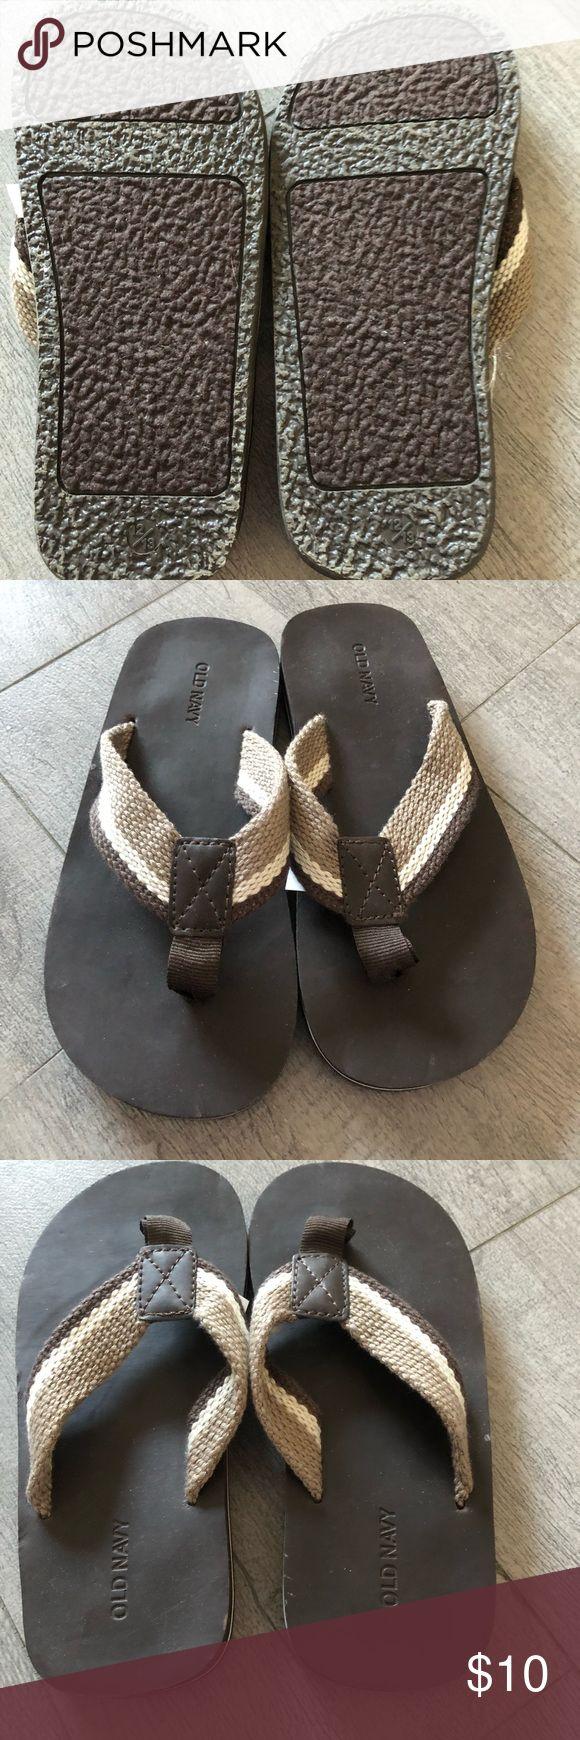 Toddler Flip Flops Never worn Old Navy Flip Flops. Brand new condition! Old Navy Shoes Sandals & Flip Flops